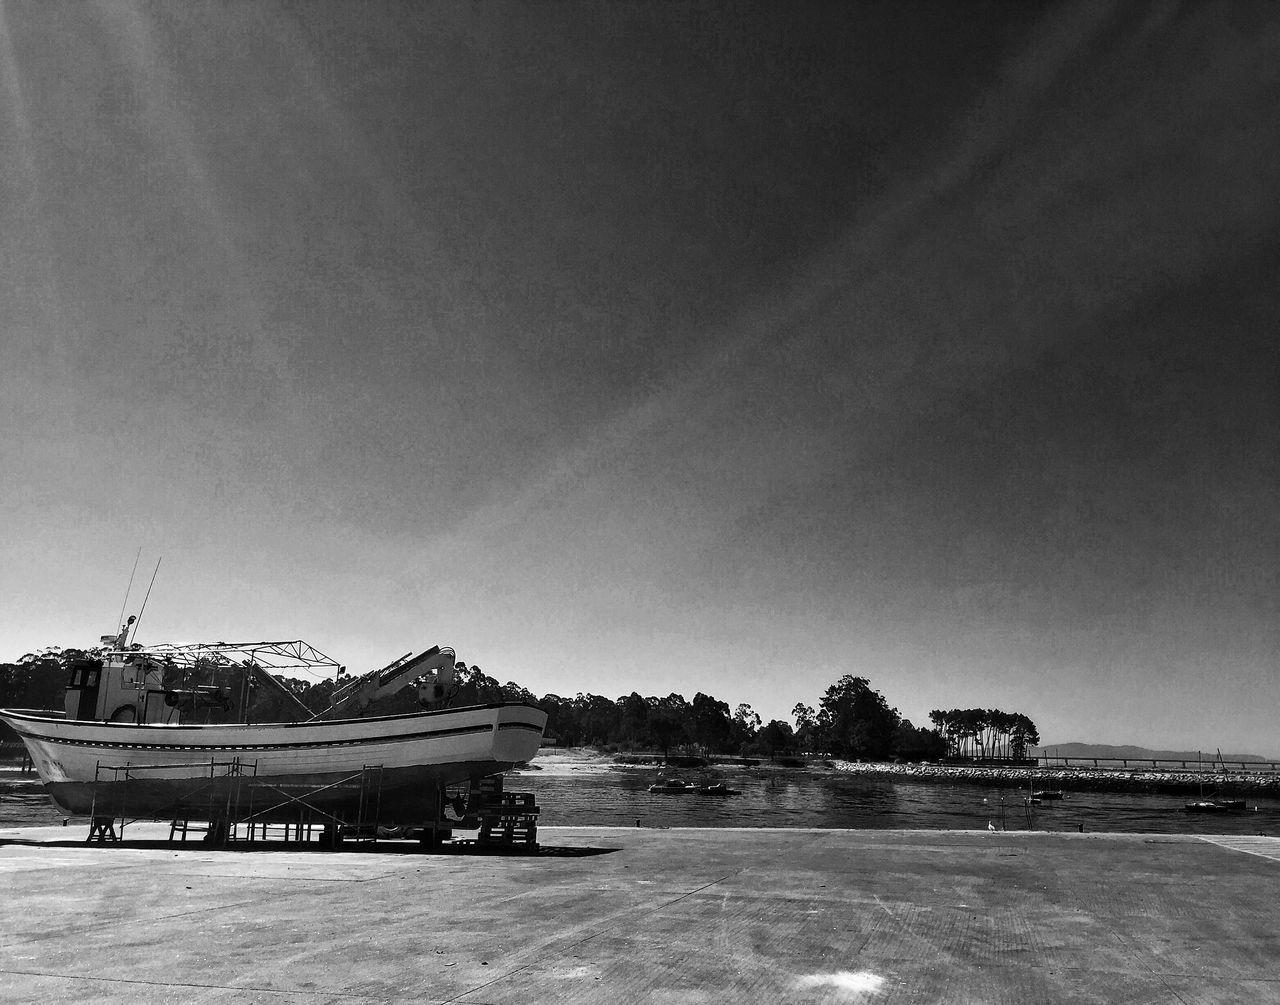 Blackandwhite Nautical Vessel Boats Dry Land